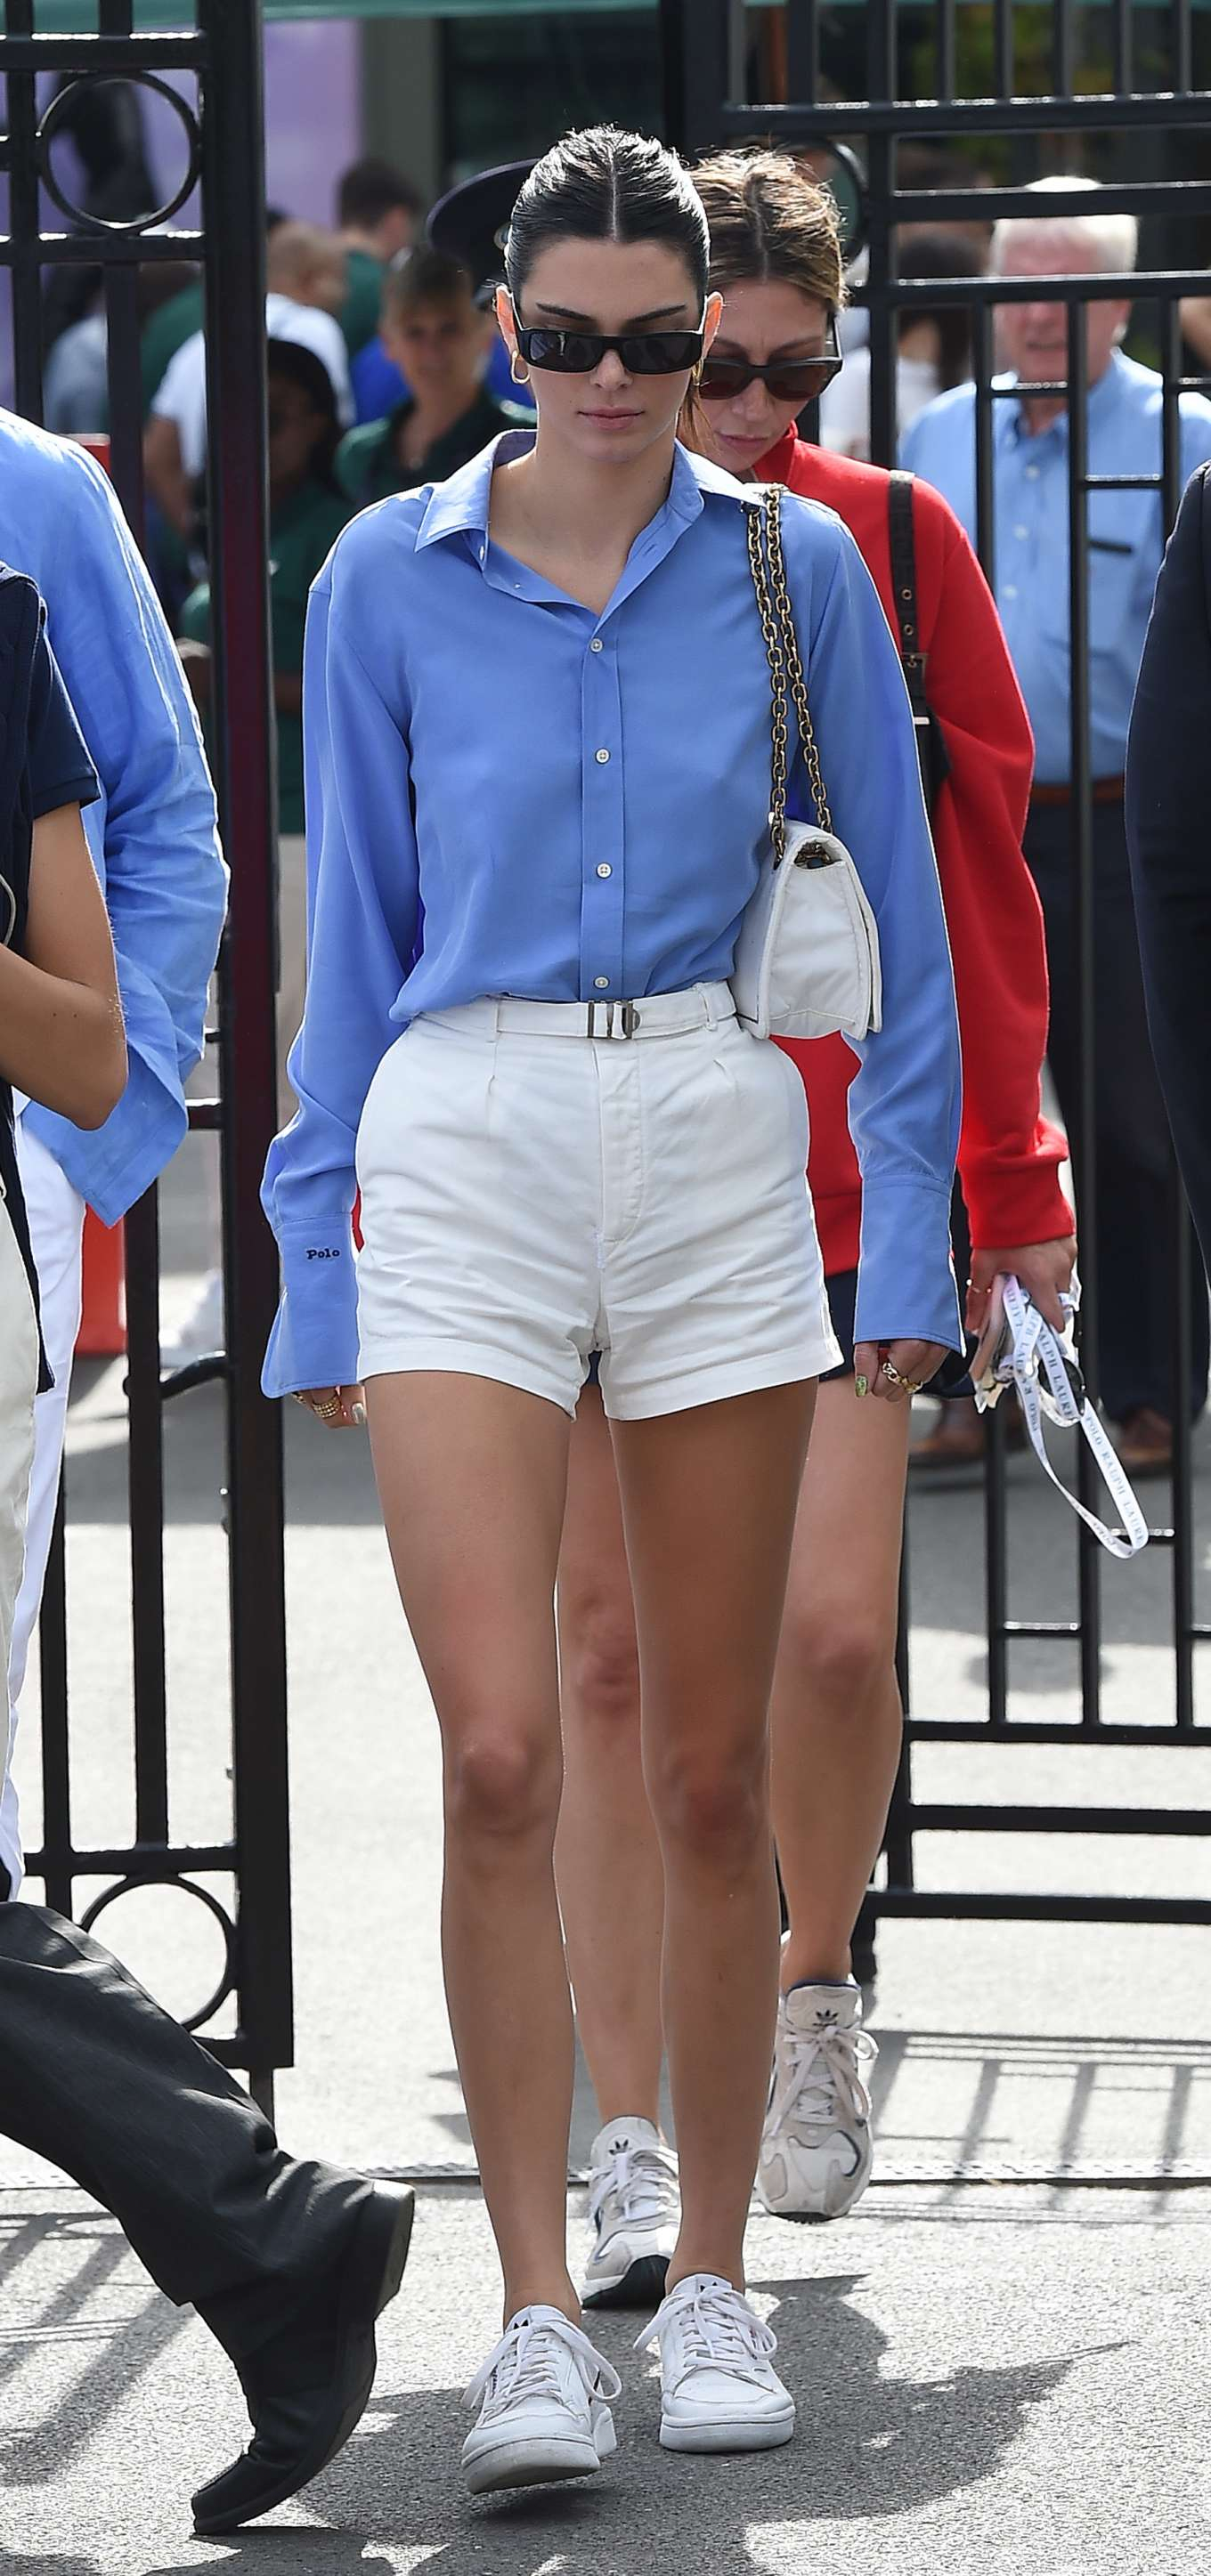 Kendall Jenner 2019 : Kendall Jenner – Leaving the 2019 Wimbledon Tennis Championships-03